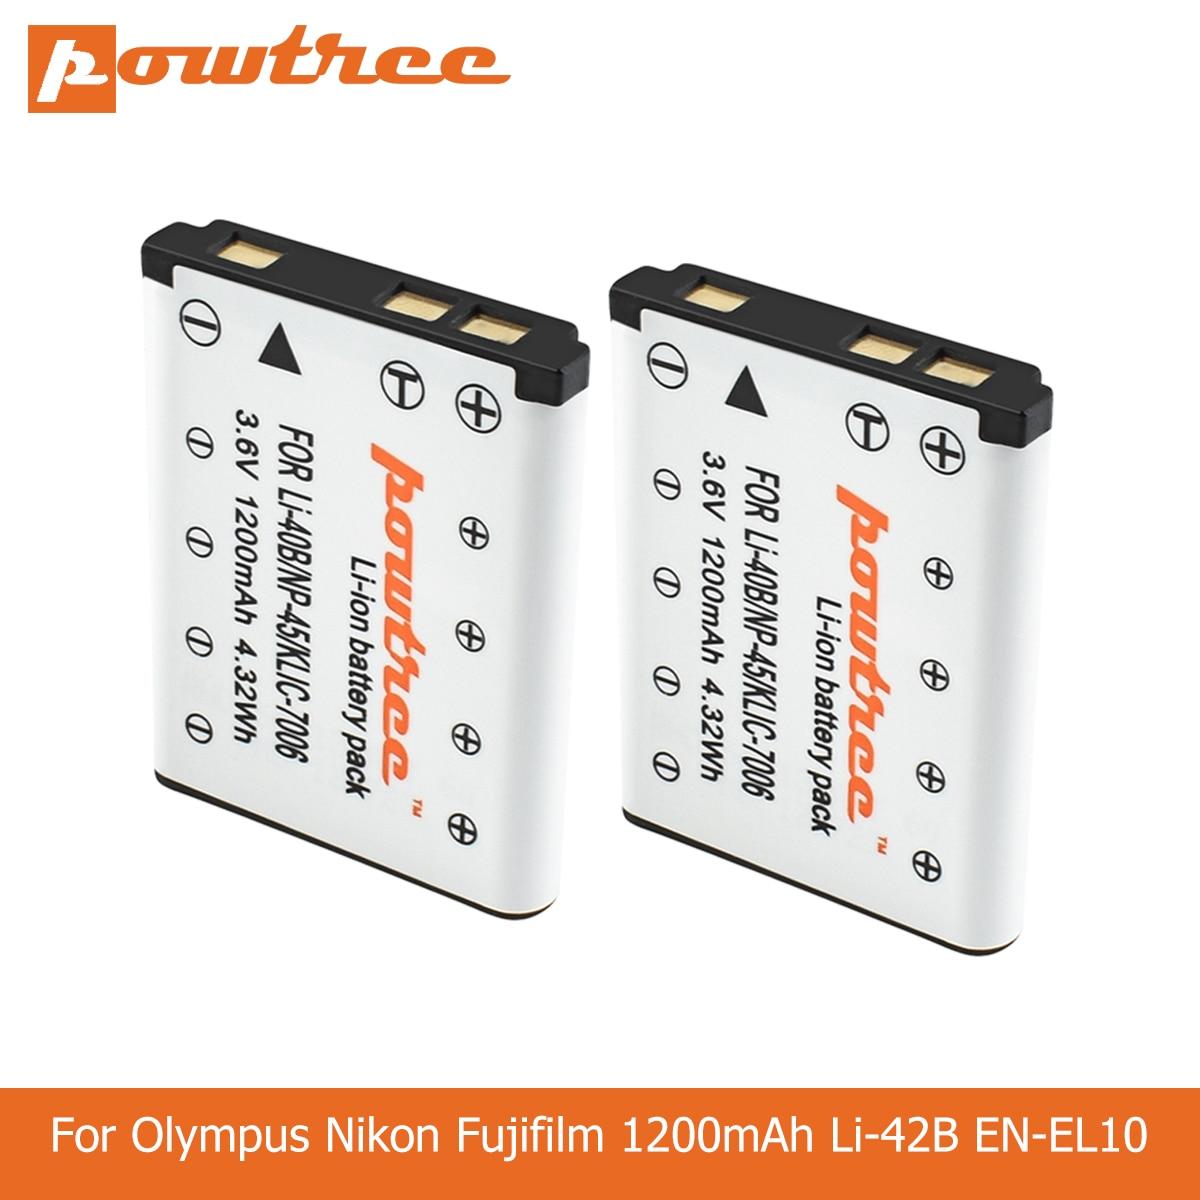 Powtree 1200mah Li-40B li40b np45 Li-42B EN-EL10 en el10 enel10 baterias de câmera digital para olympus nikon fujifilm kodak l50